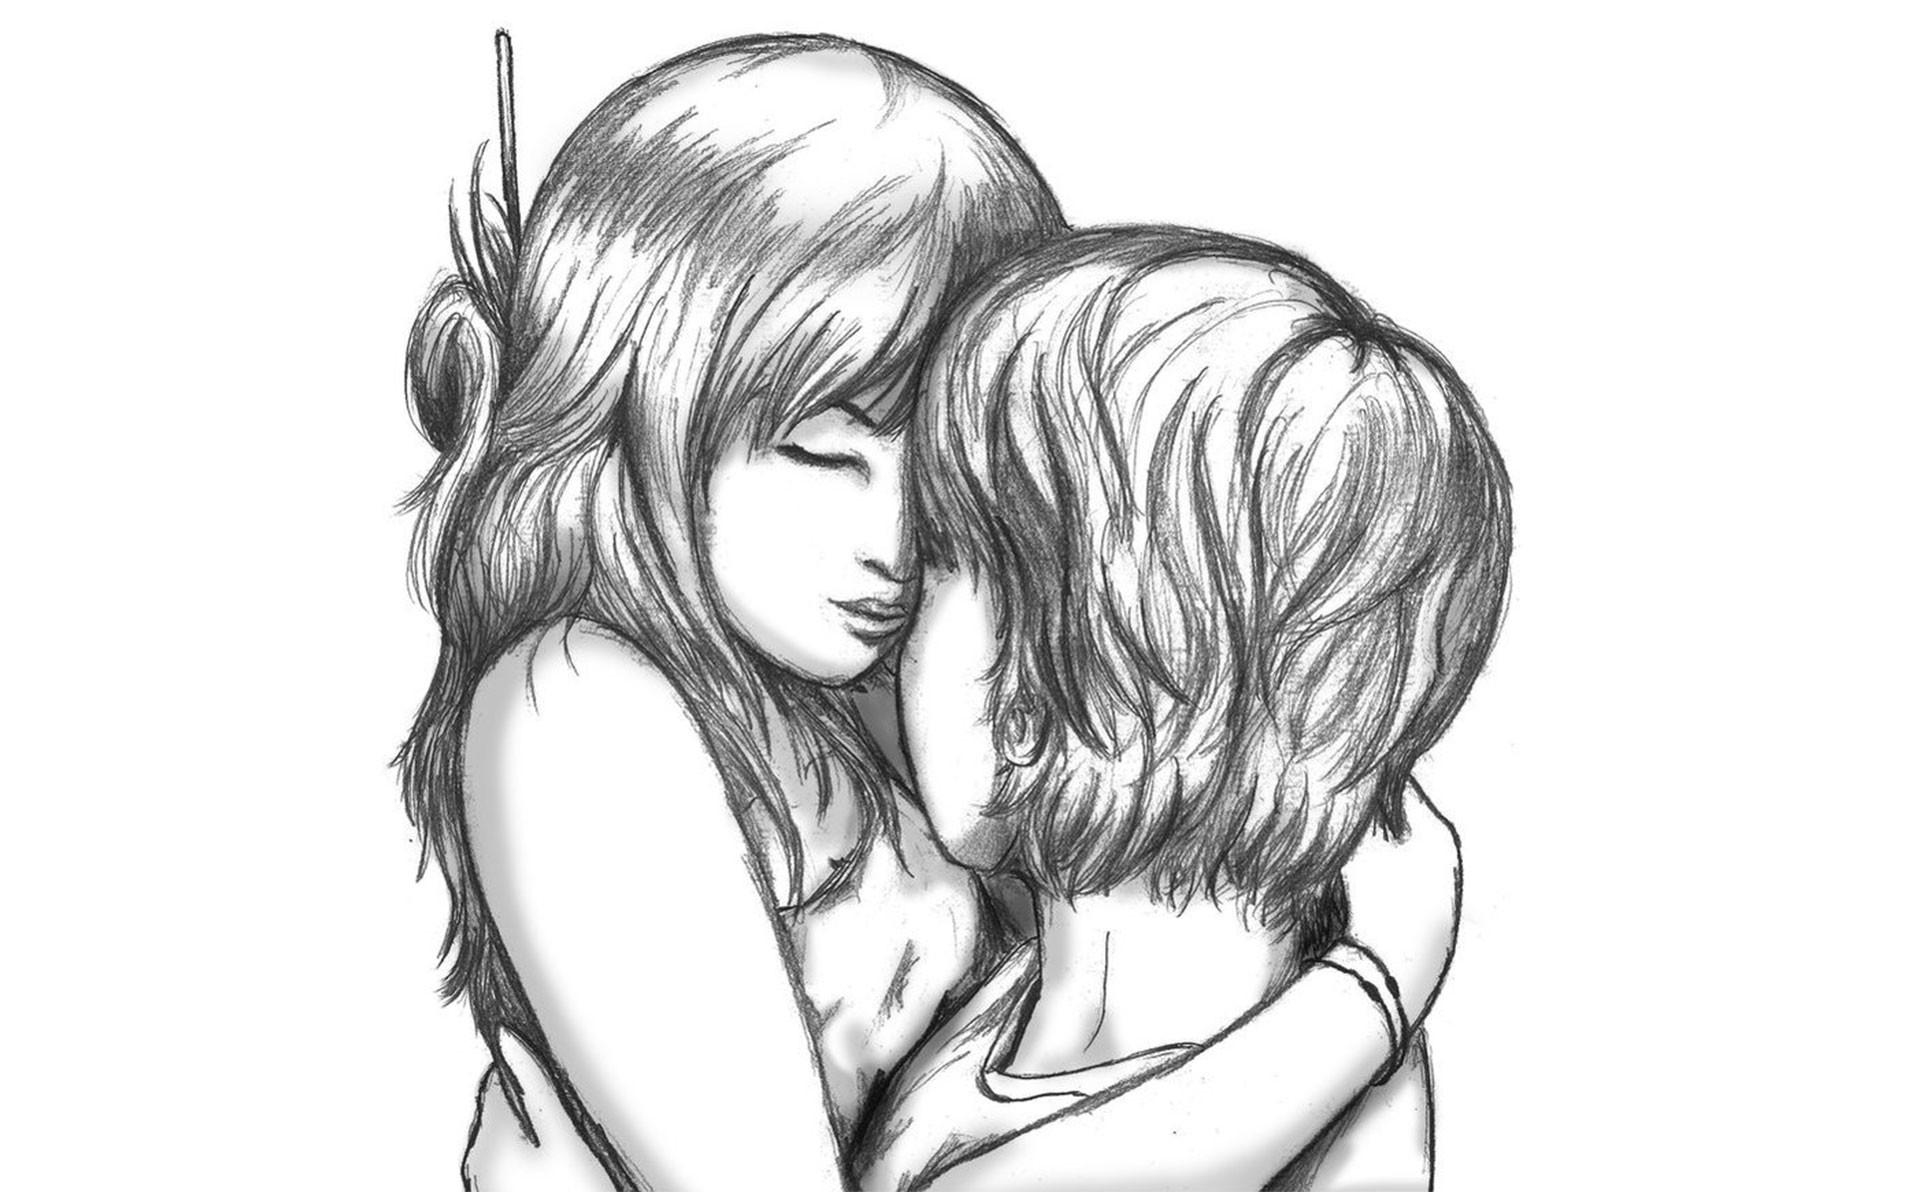 Cute Love Cartoon Image Sketch Cute Cartoon Love Couple Boy And Girl Kissing Sketch 1920x1200 Wallpaper Teahub Io